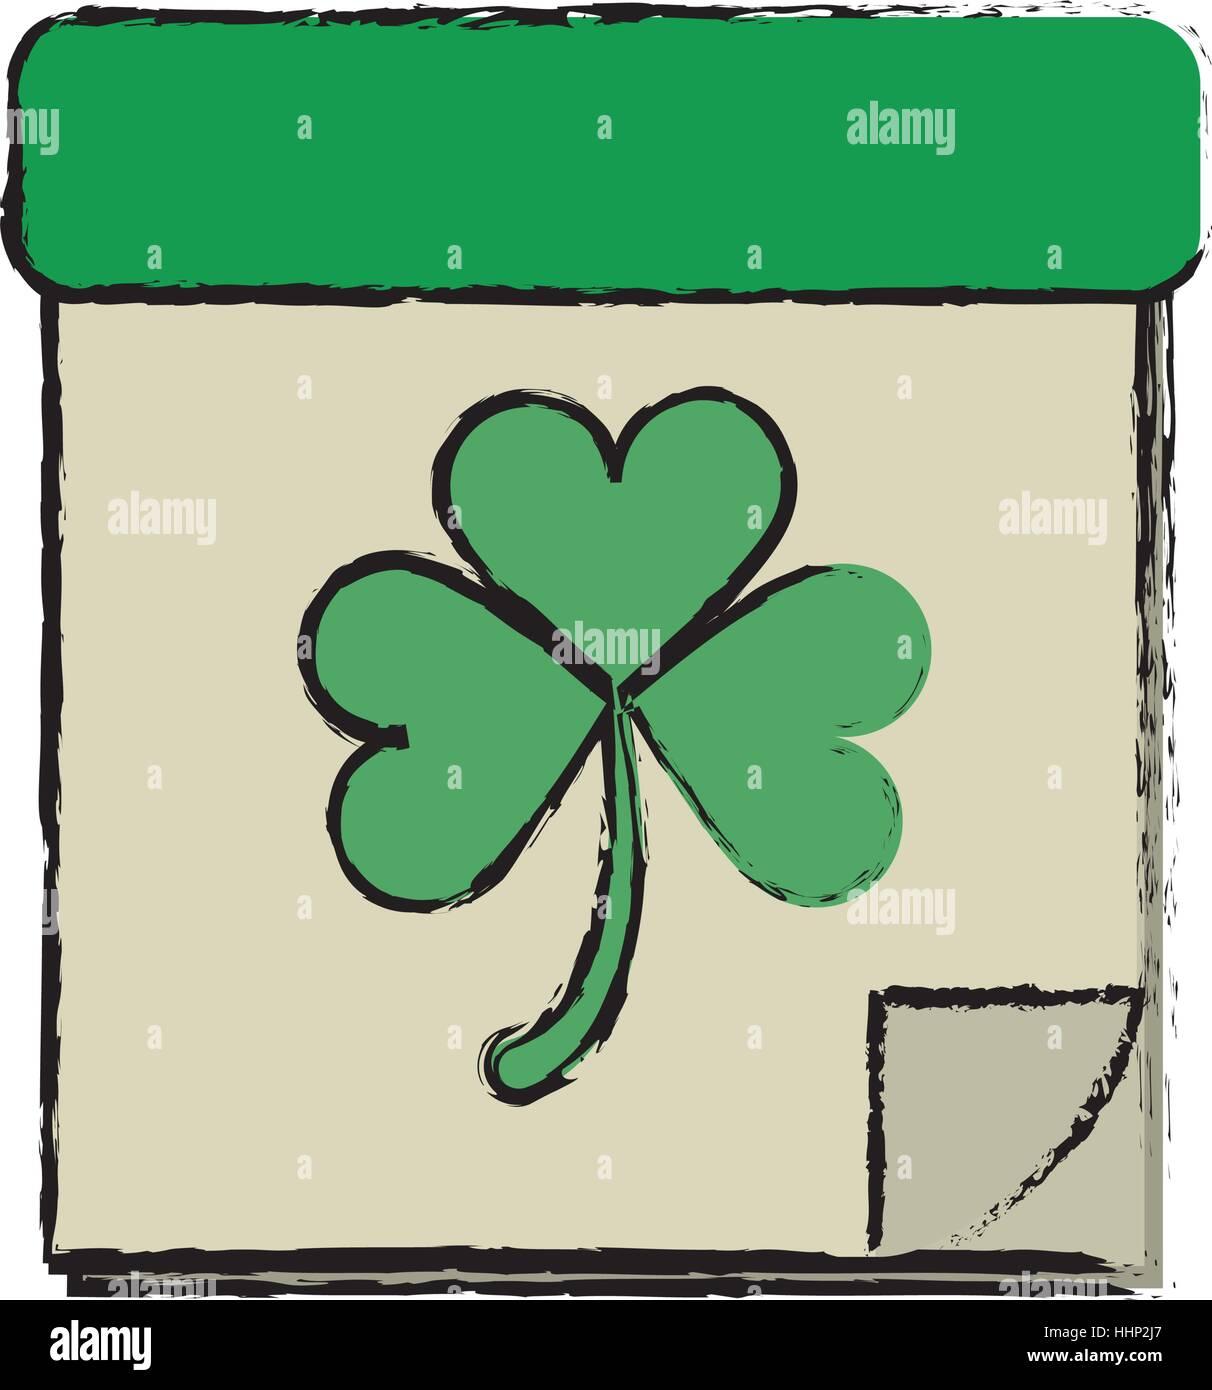 cartoon calendar clover st patrick day irish culture - Stock Image